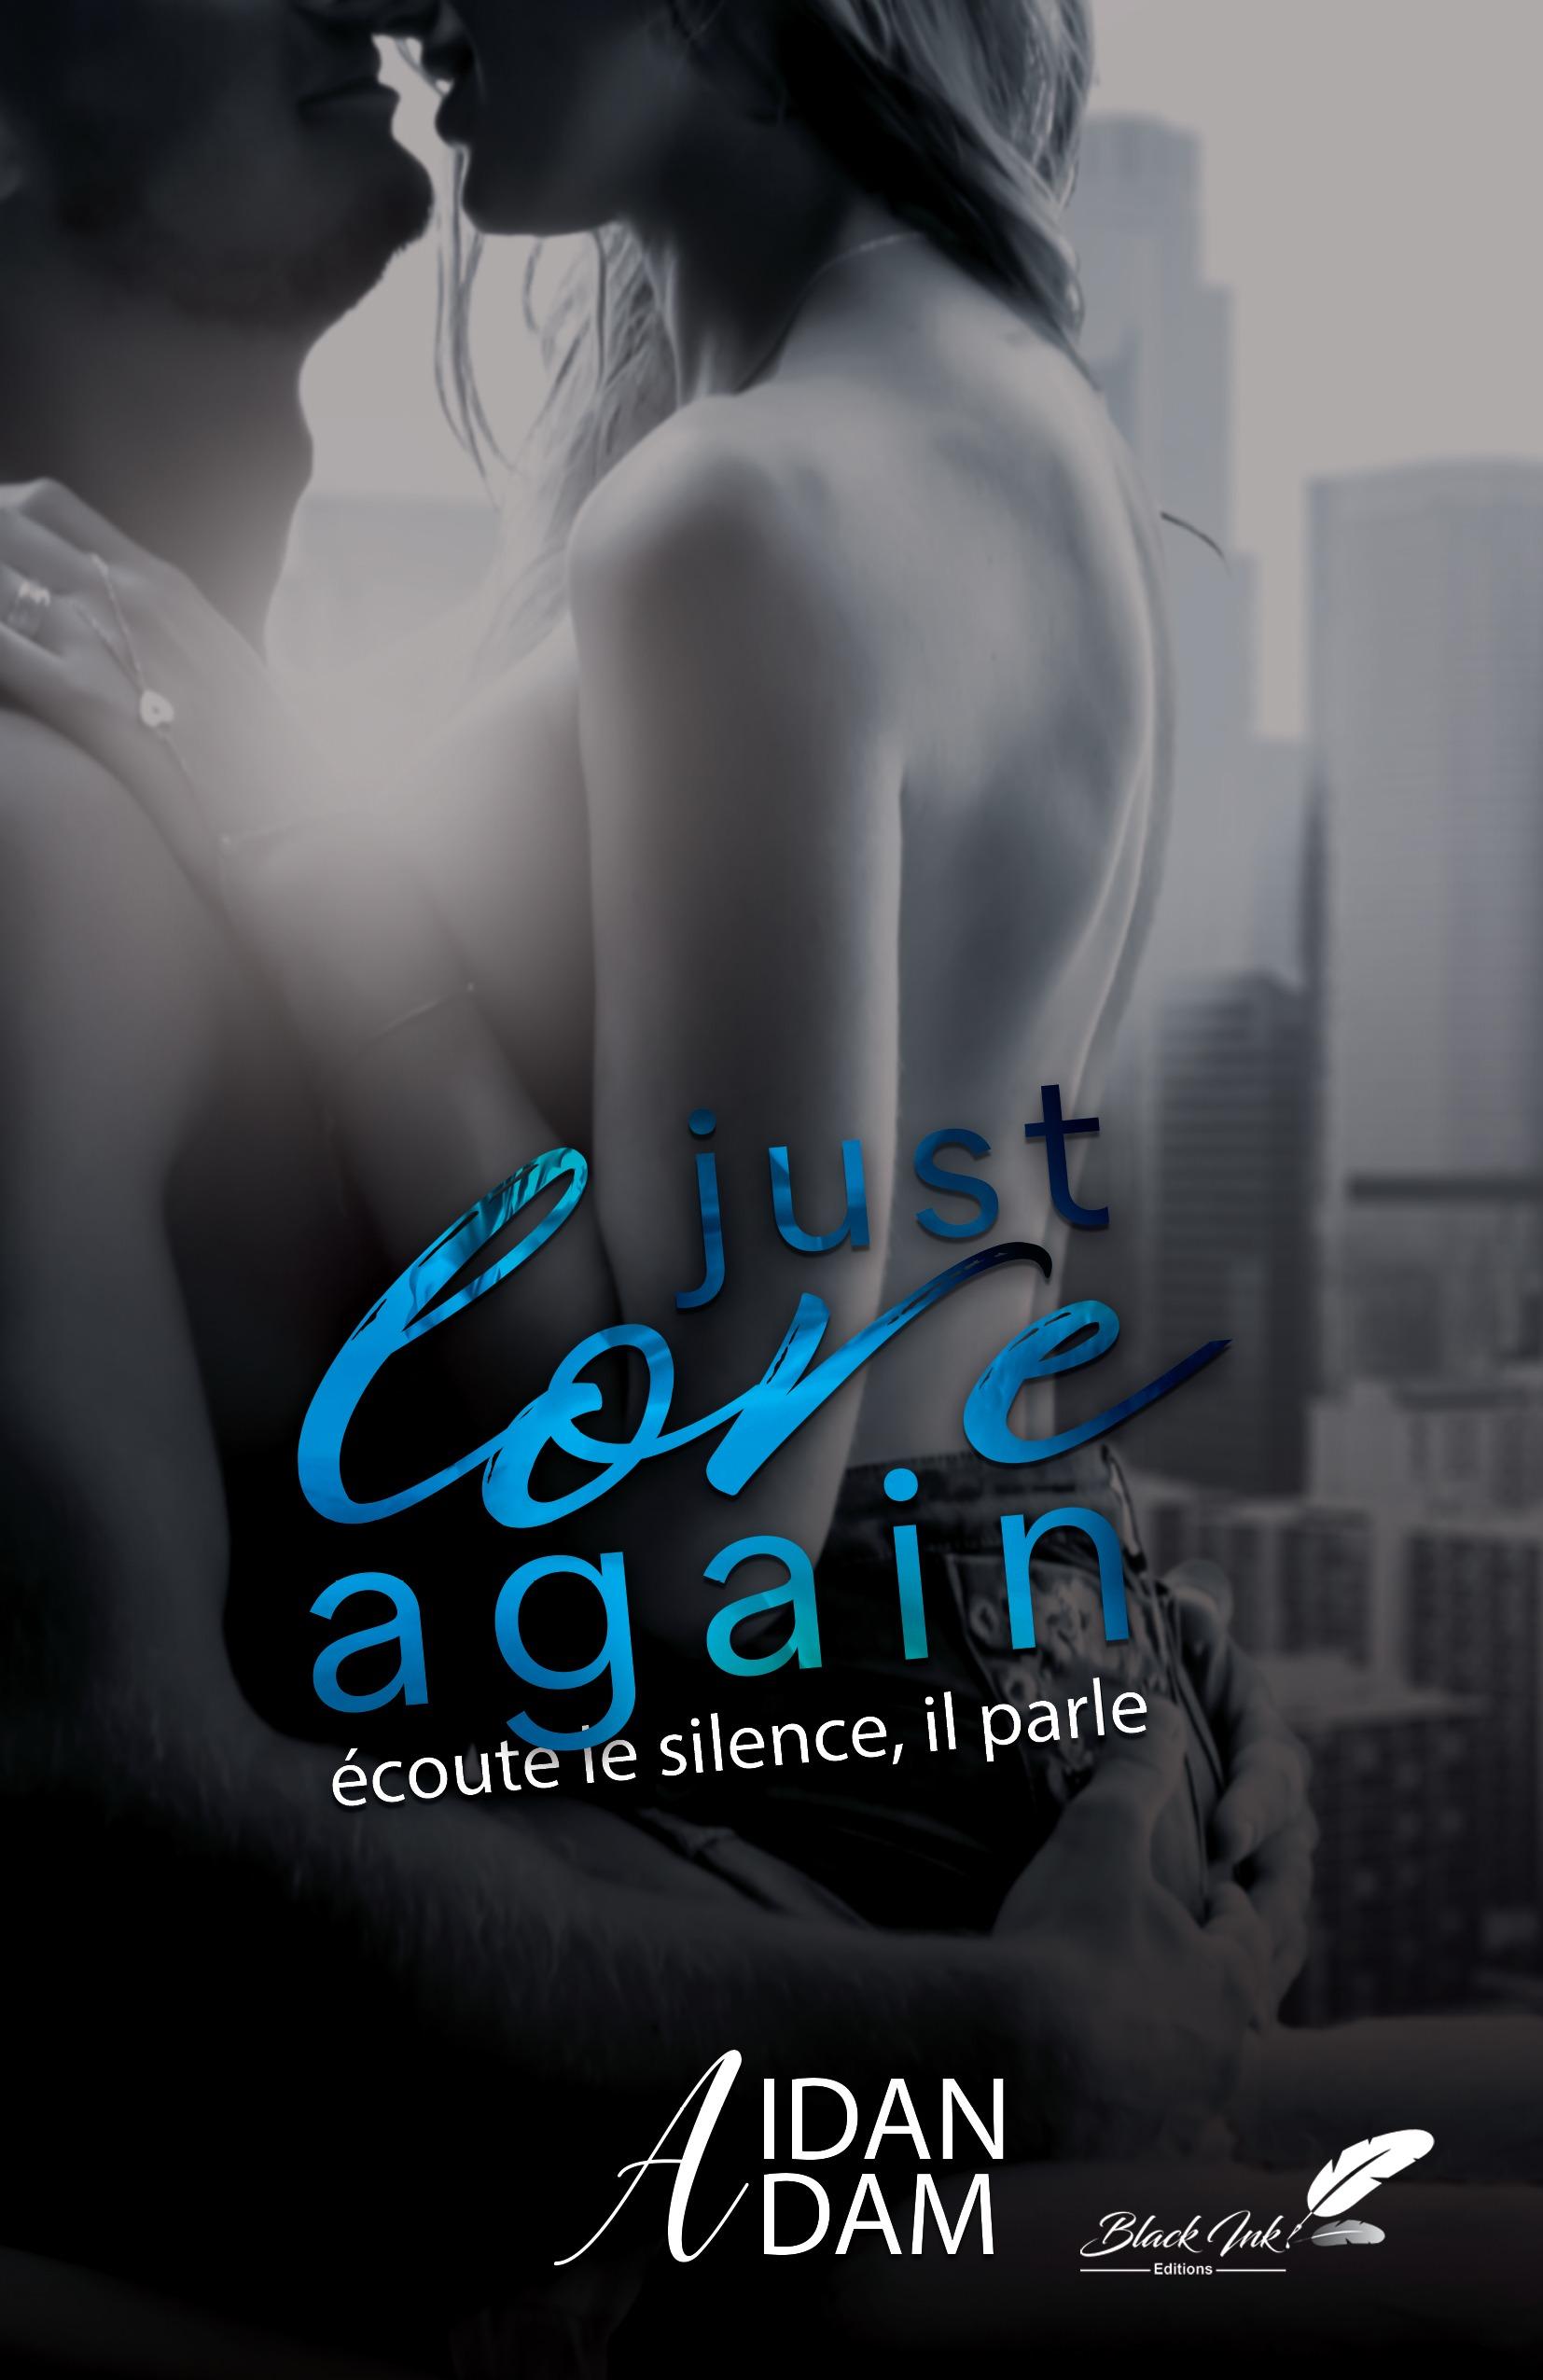 Just Love Again : Écoute le silence, il parle.